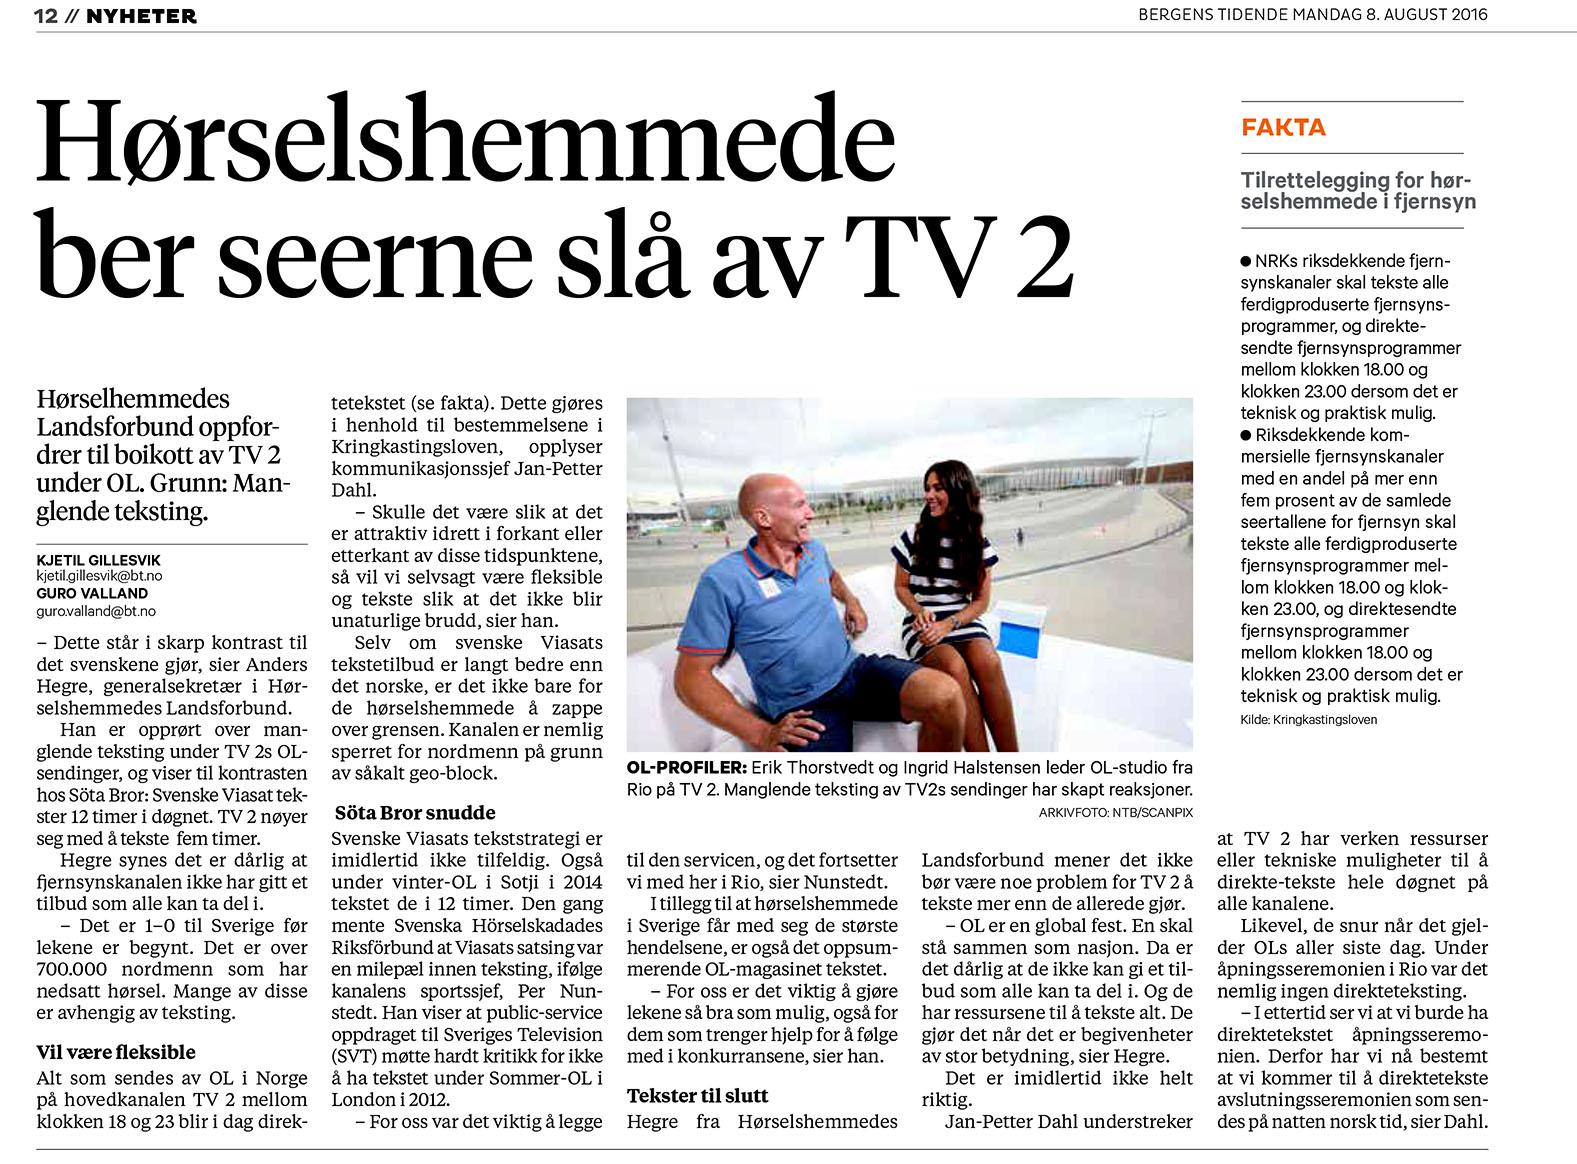 2016-08-08 BT TV2-teksting